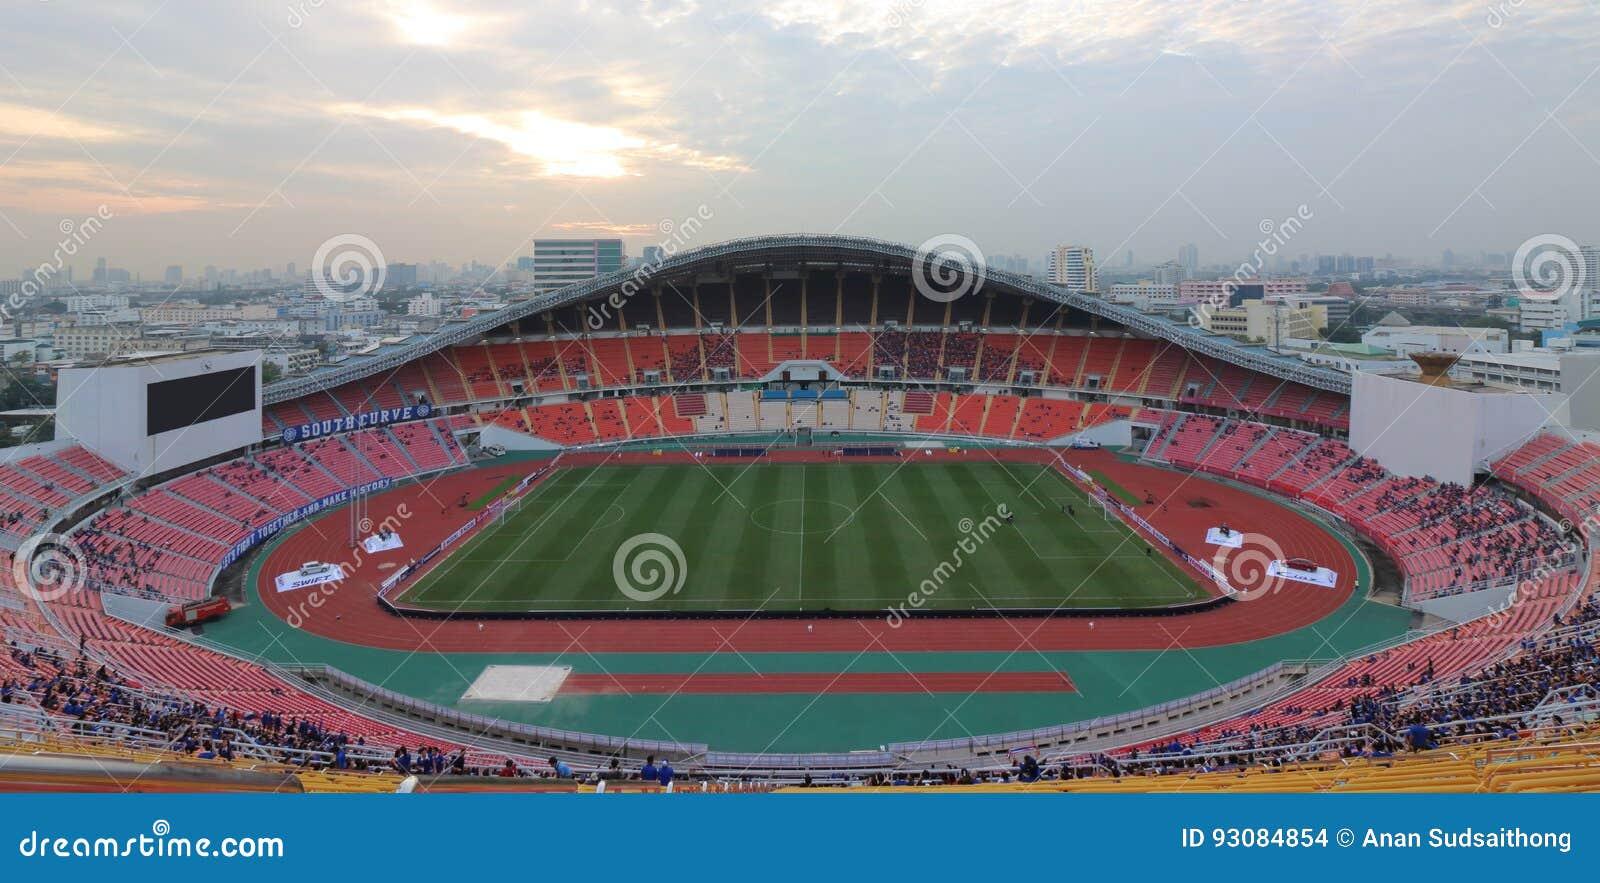 Bangkok Thailand December 8 2016 Panoramic View Of Rajamangala Home National Stadium Of